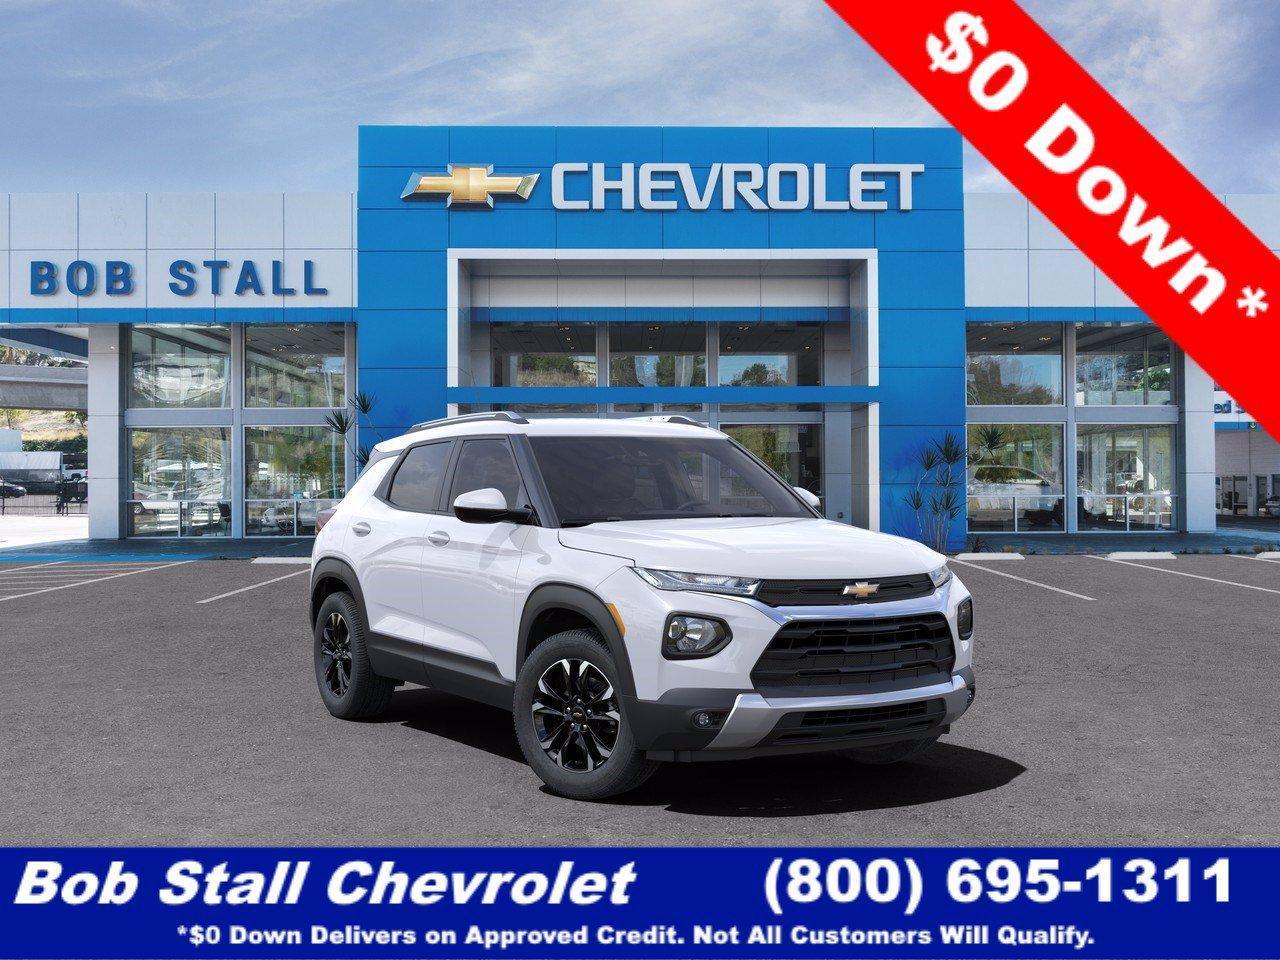 2021 Chevrolet Trailblazer Vehicle Photo in La Mesa, CA 91942